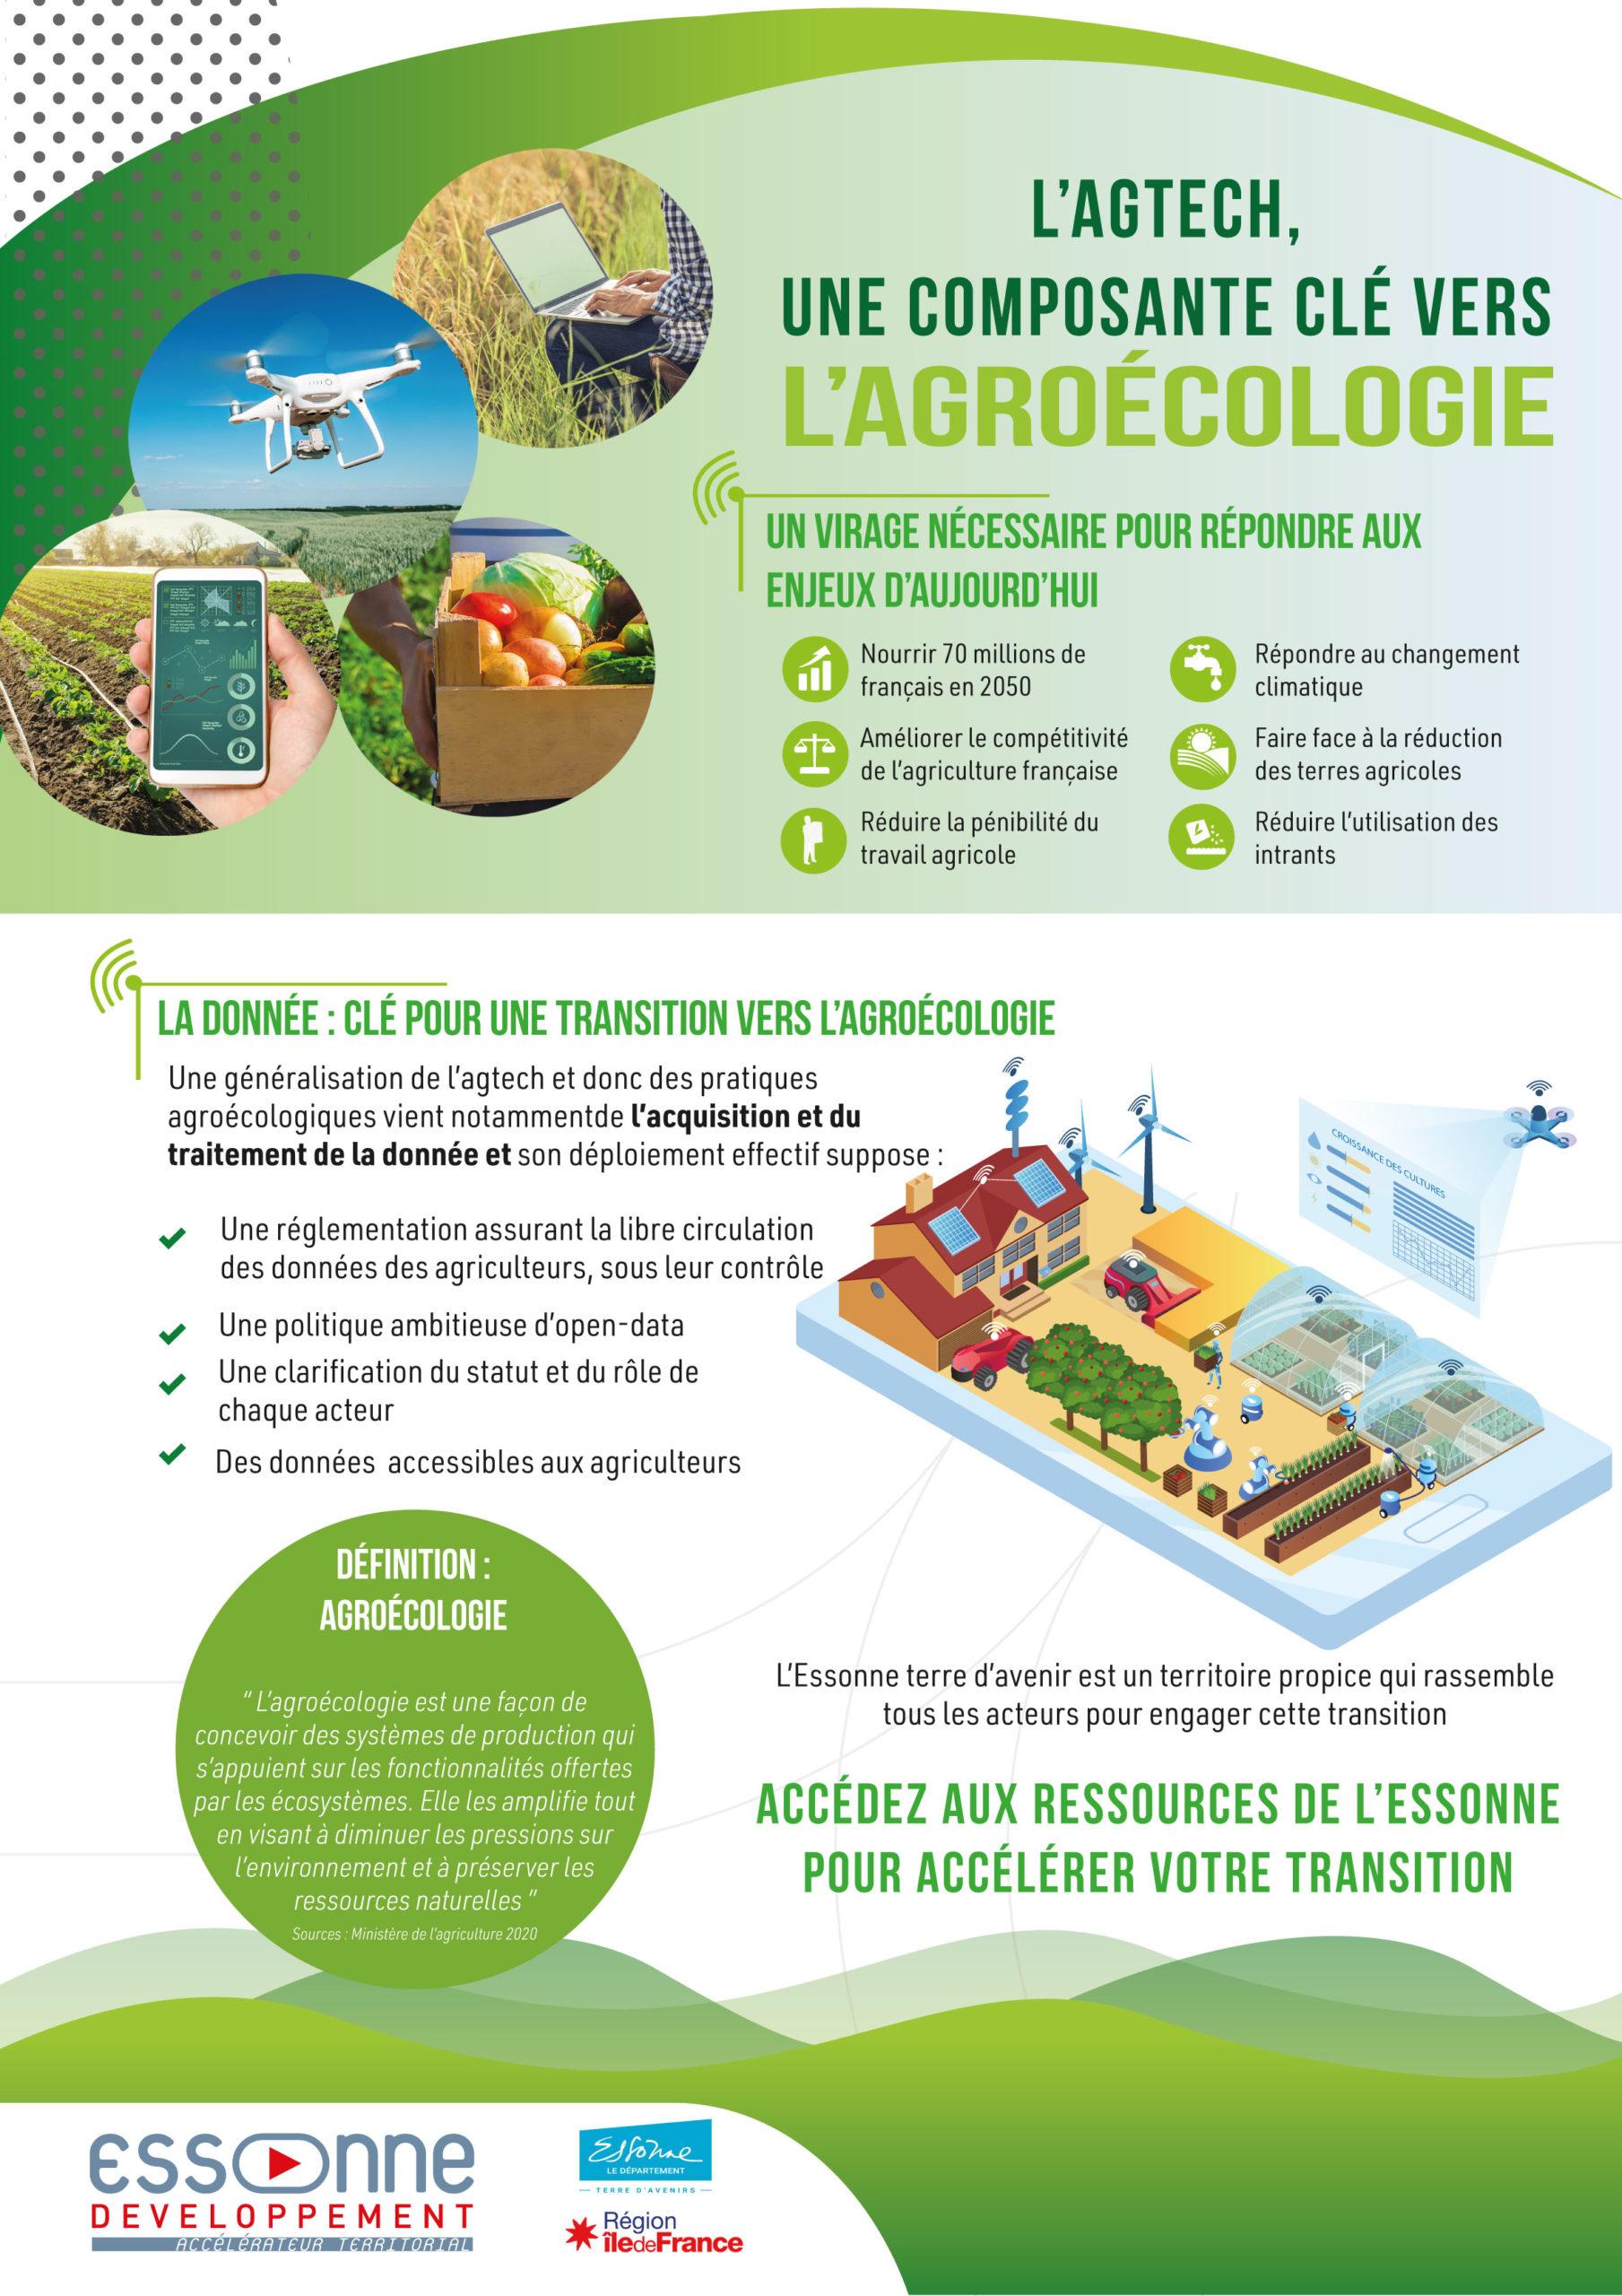 Couv-plaquette-agritech-EssDev-2020v4f